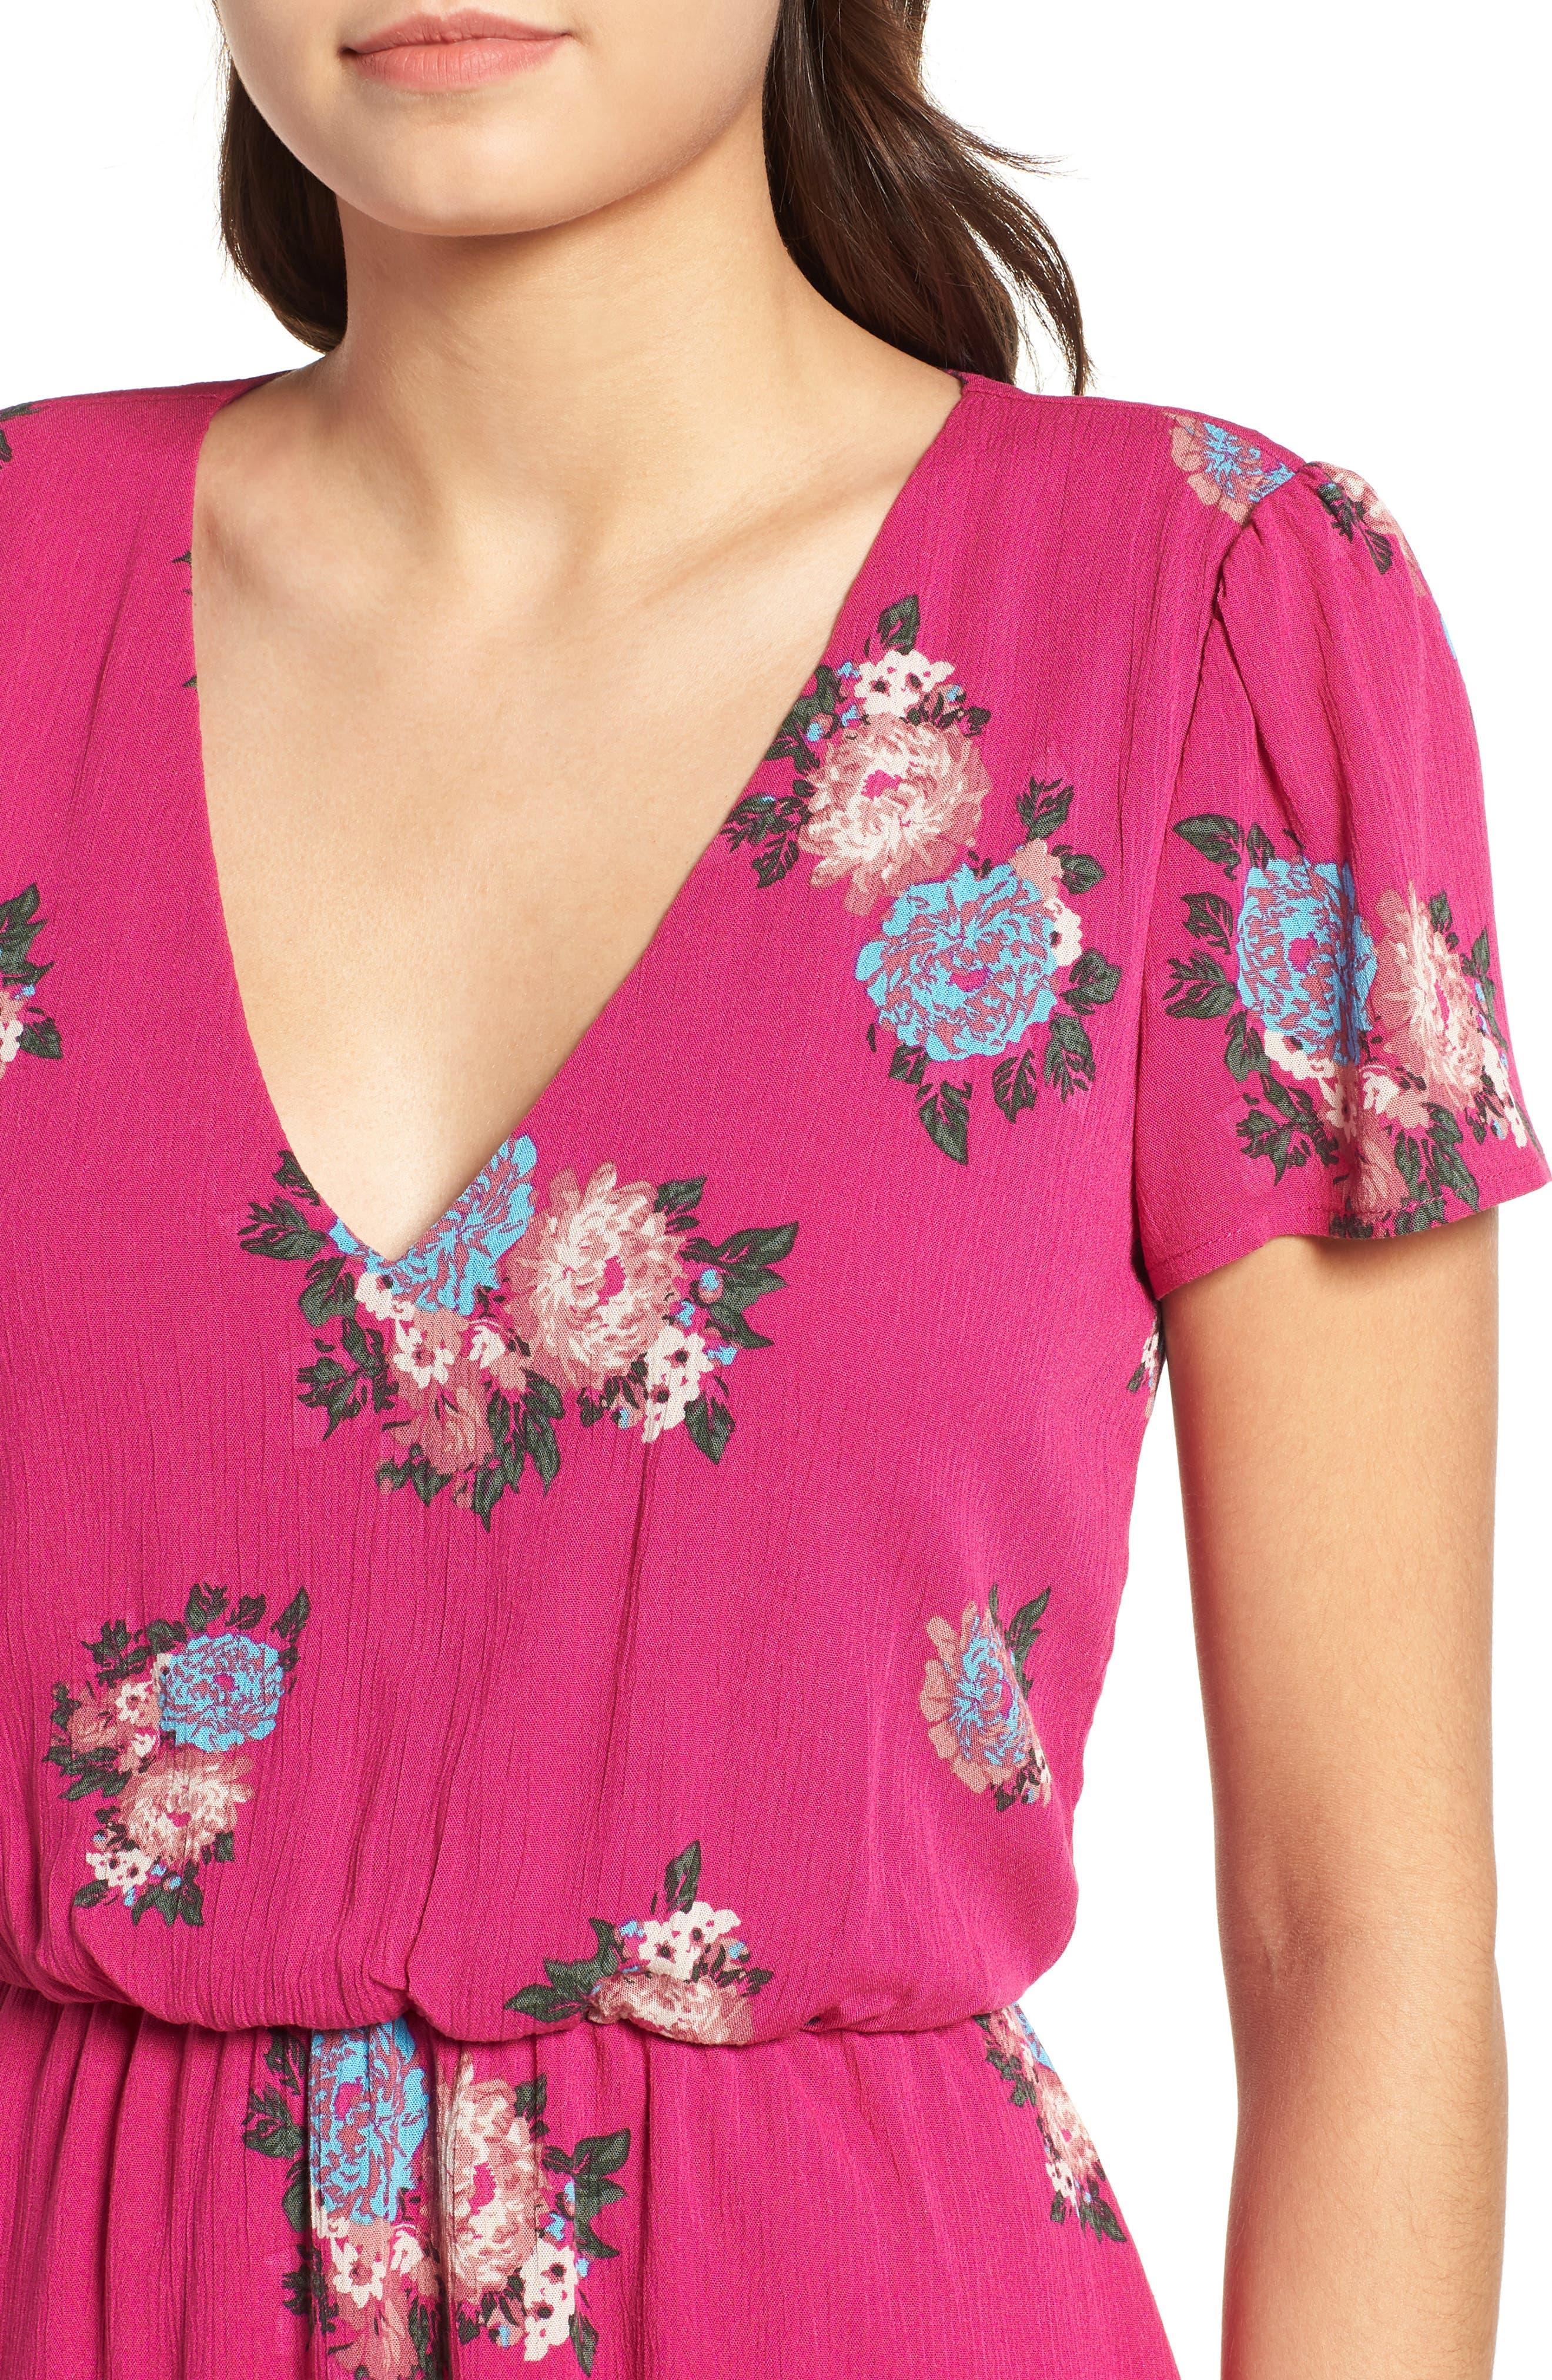 Blouson Midi Dress,                             Alternate thumbnail 4, color,                             Pink Berry Floral